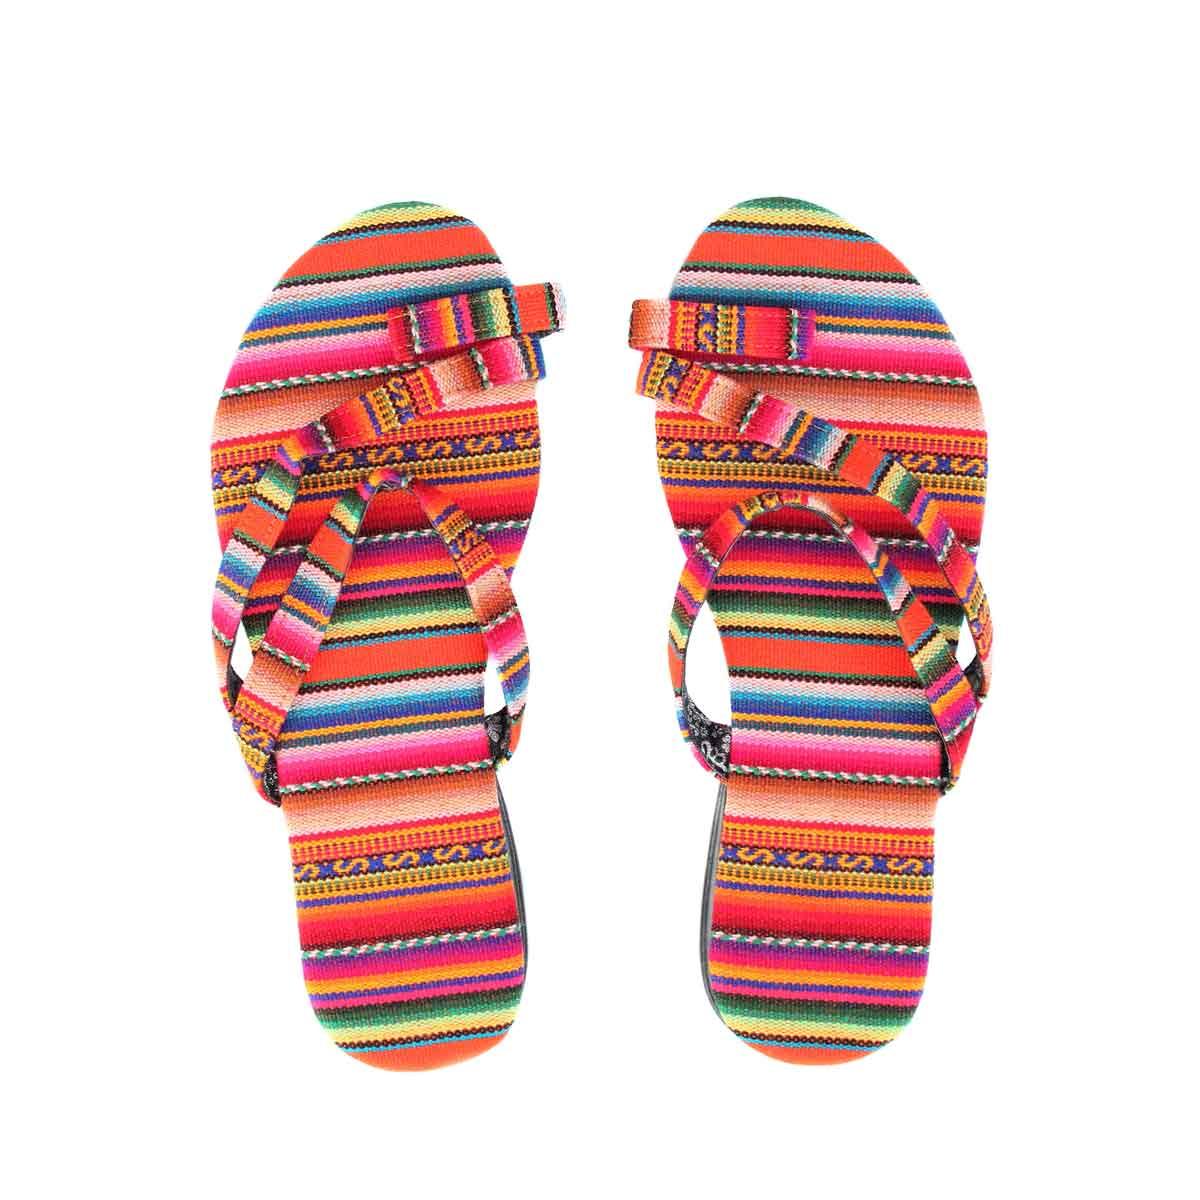 Inka-Products-Sandales Péruviennes-Orange